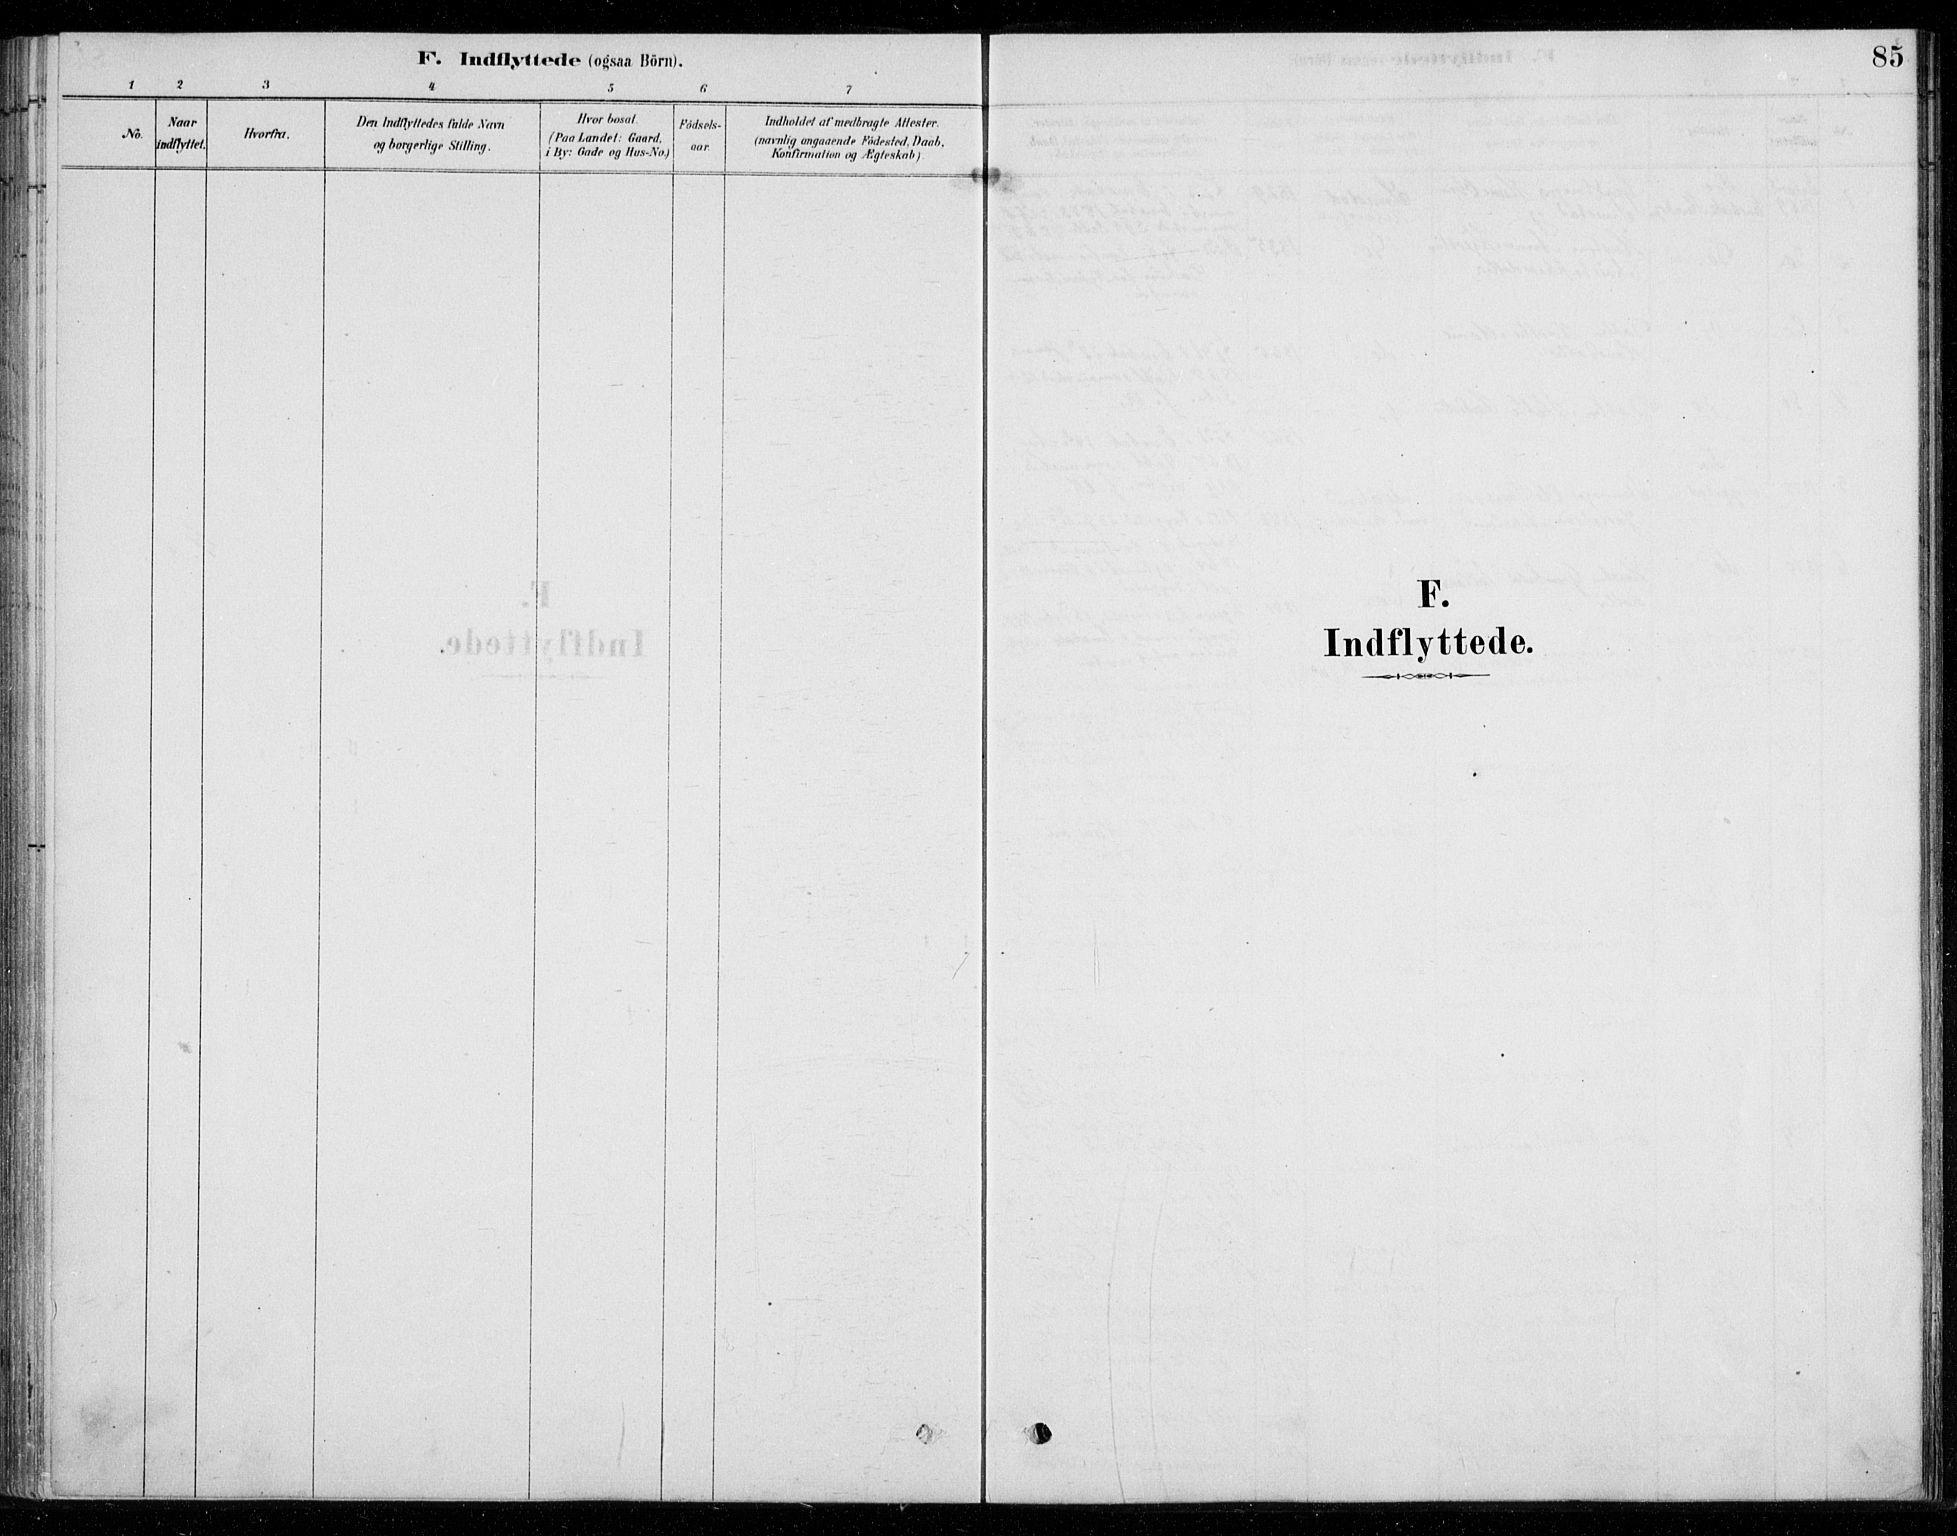 SAO, Fet prestekontor Kirkebøker, G/Gb/L0002: Klokkerbok nr. II 2, 1878-1911, s. 85